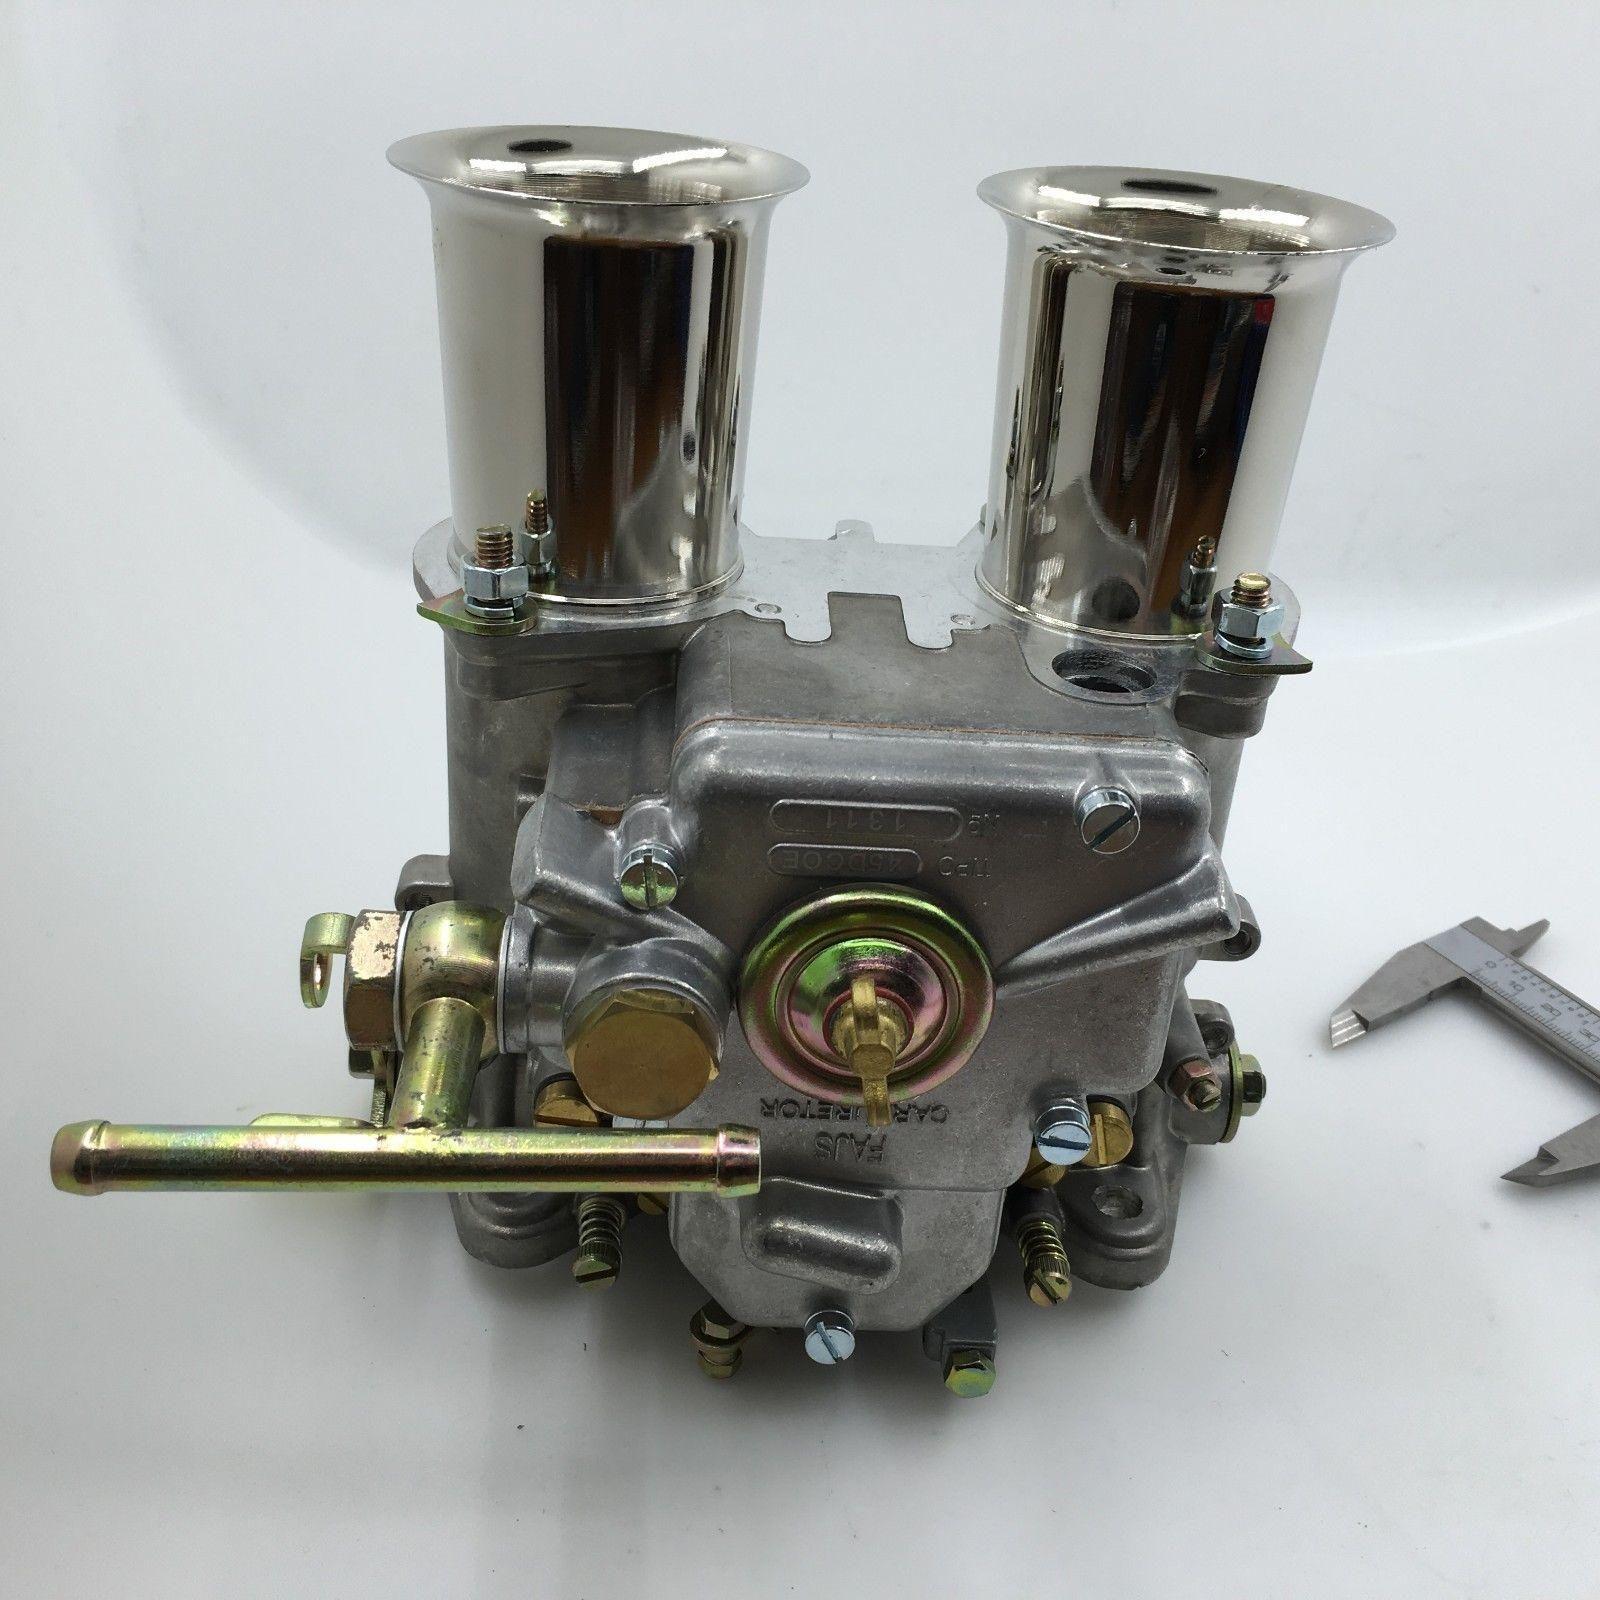 45dcoe Carburetor Carb W Air Horn 45 Dcoe Replacement For Weber Solex Dellorto